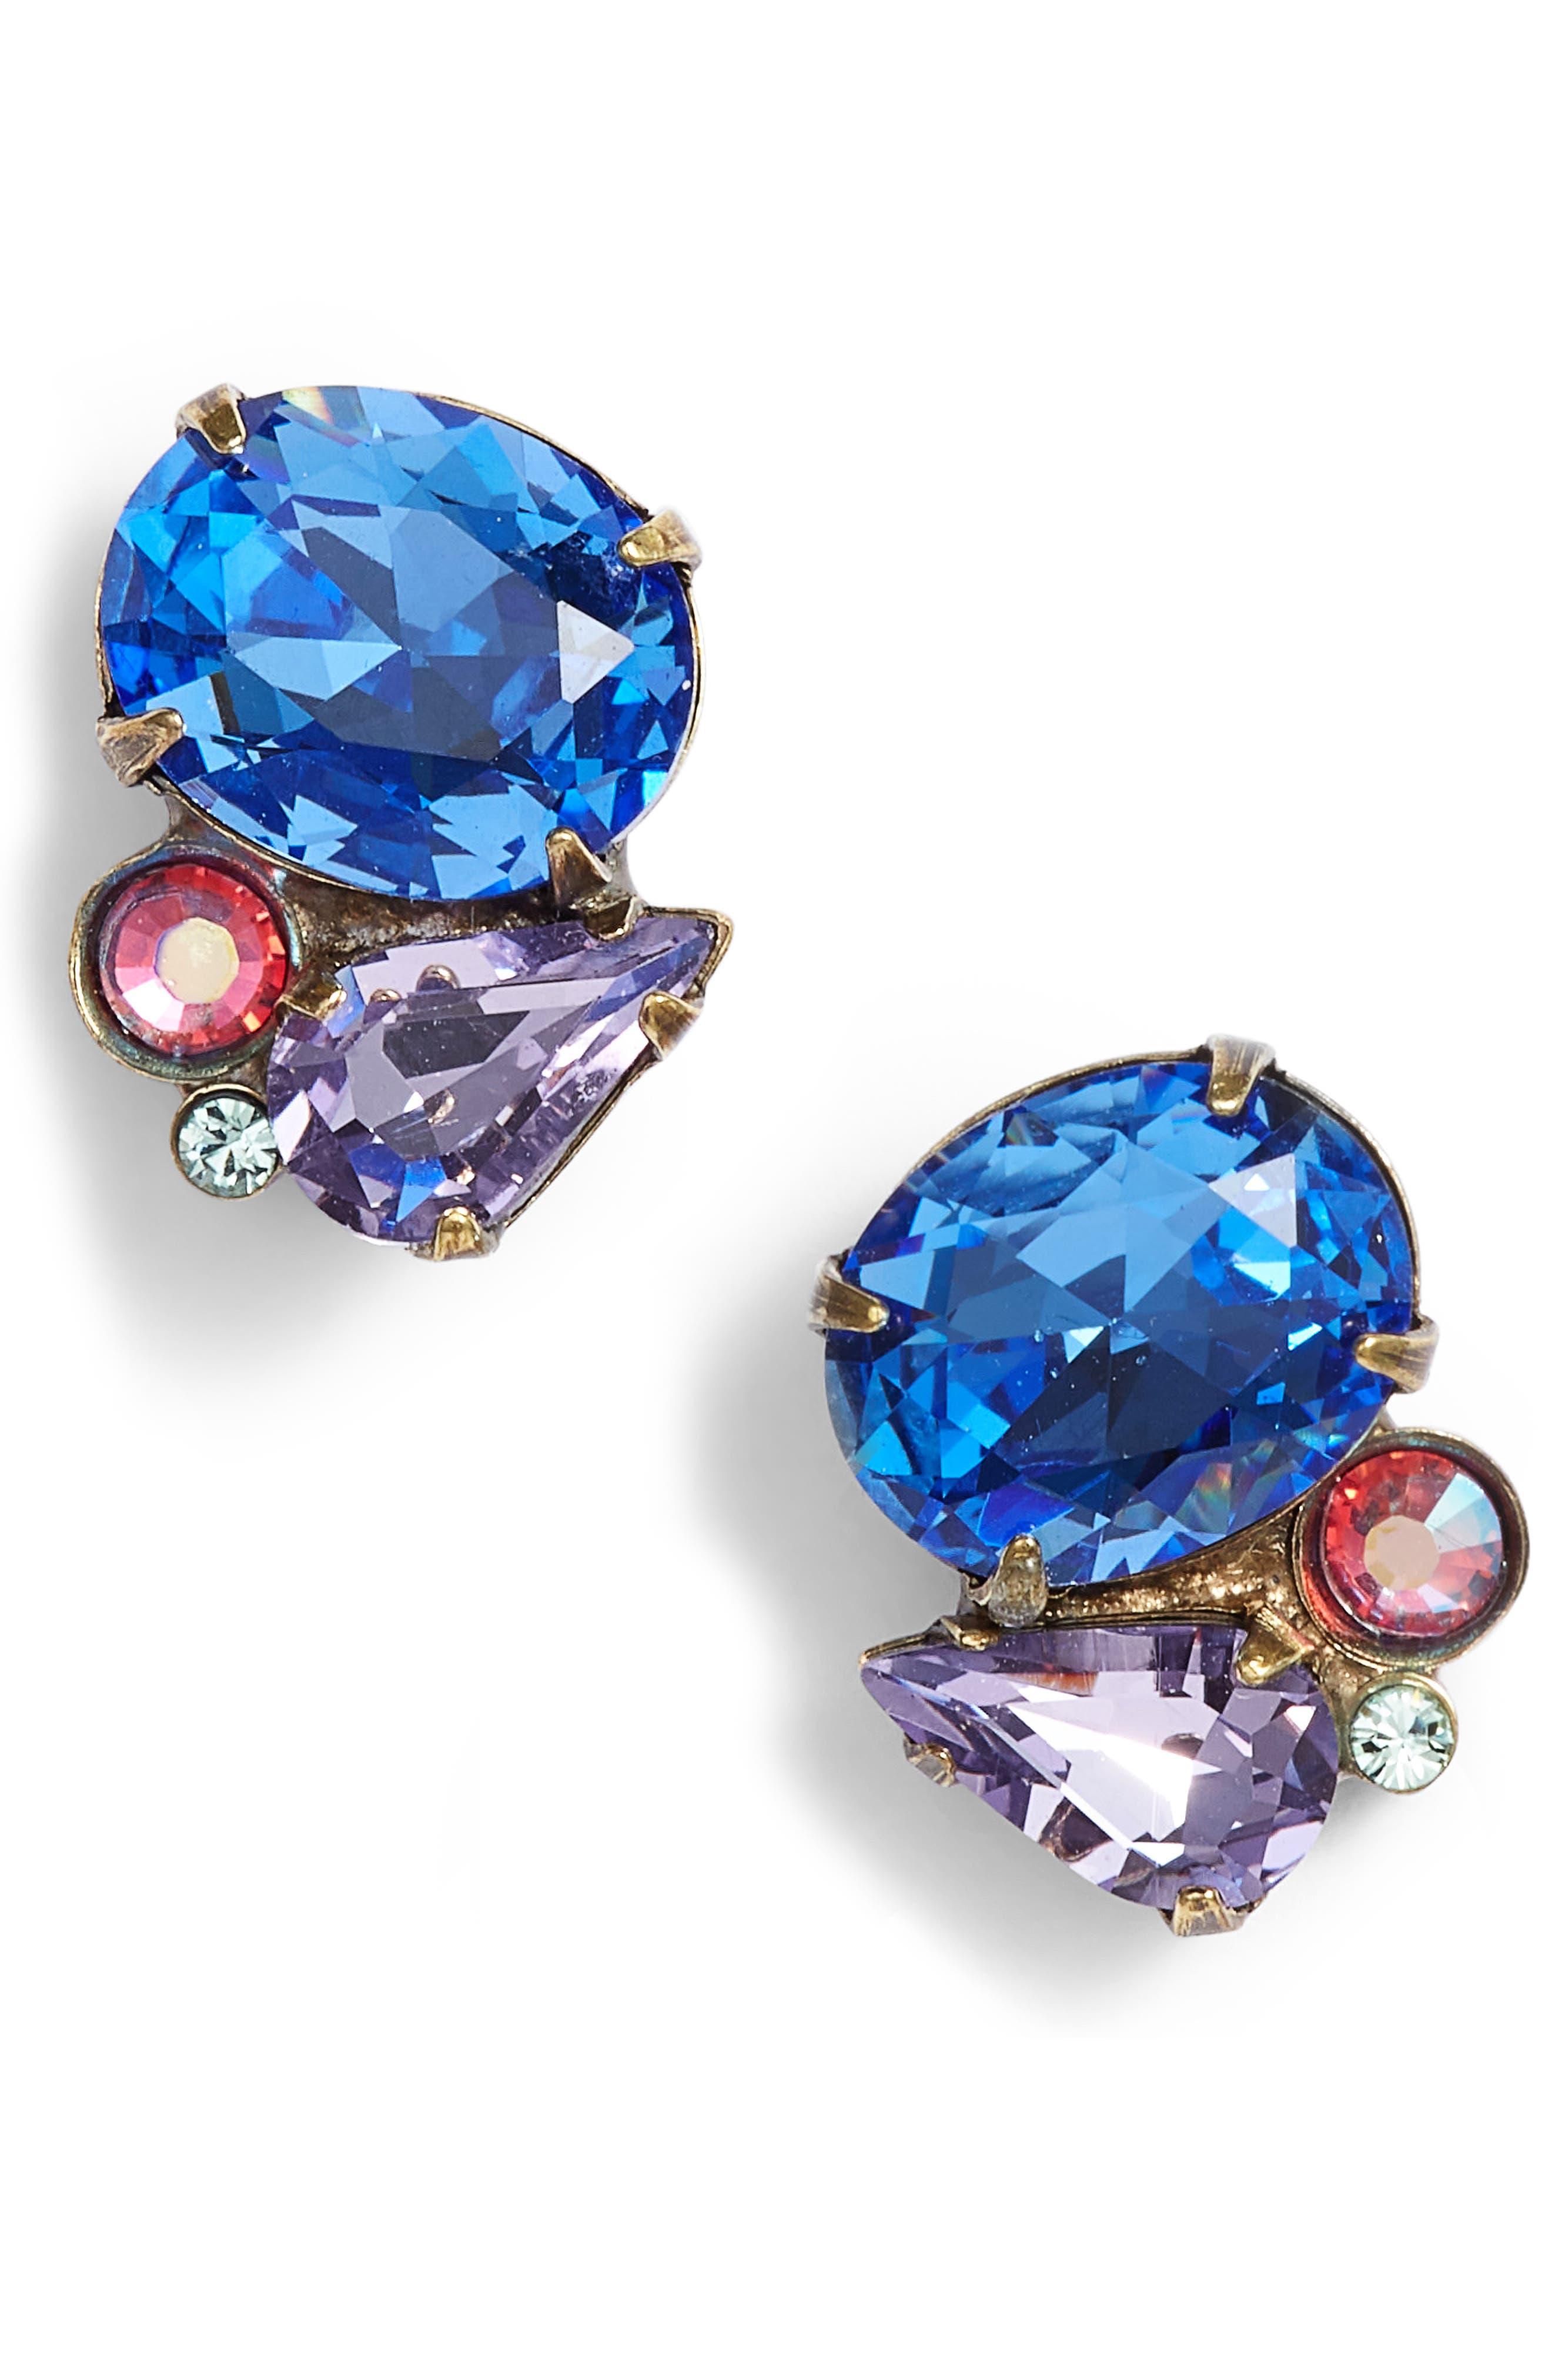 Mayflower Crystal Earrings,                             Main thumbnail 1, color,                             BLUE